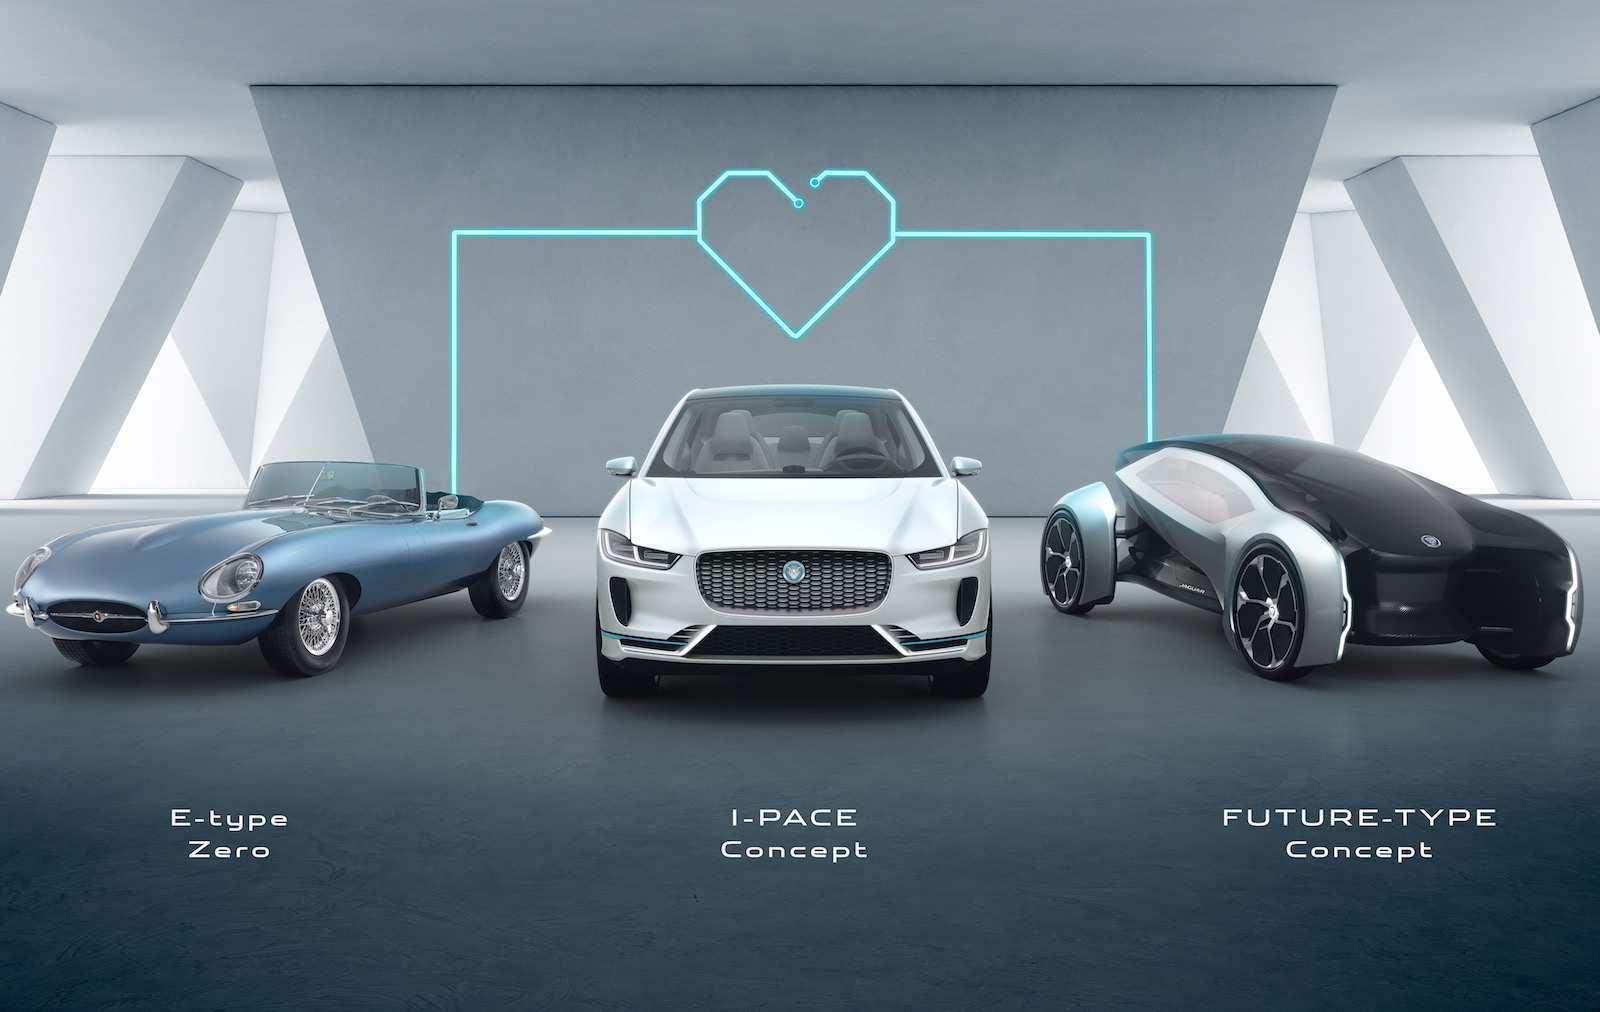 31 Concept of Jaguar Land Rover 2020 Vision Exterior and Interior with Jaguar Land Rover 2020 Vision